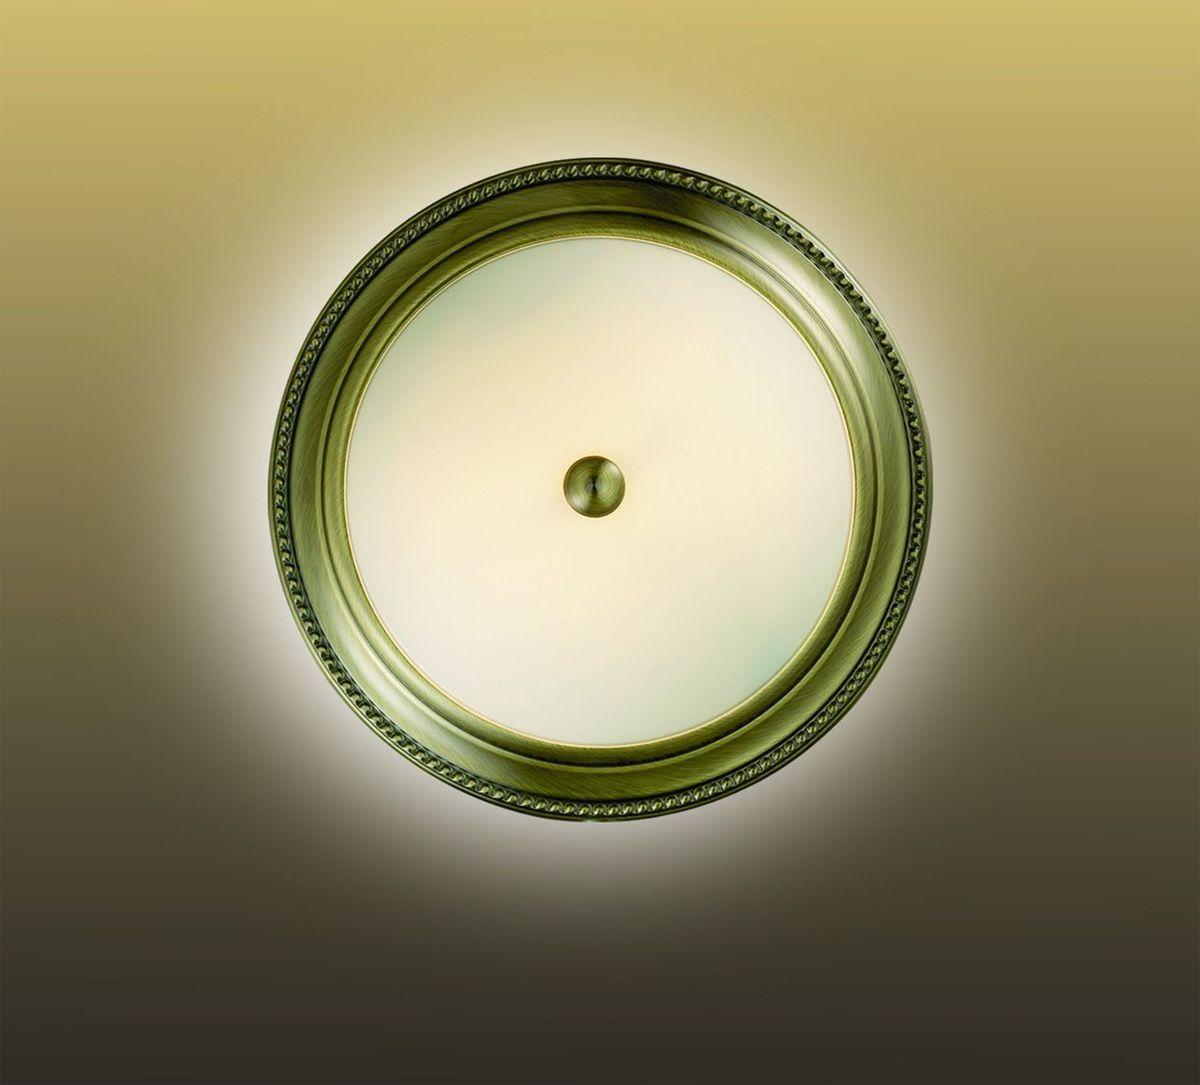 Cветильник настенный Sonex Bris, 2 х E27, 60W. 2231/S2231/S